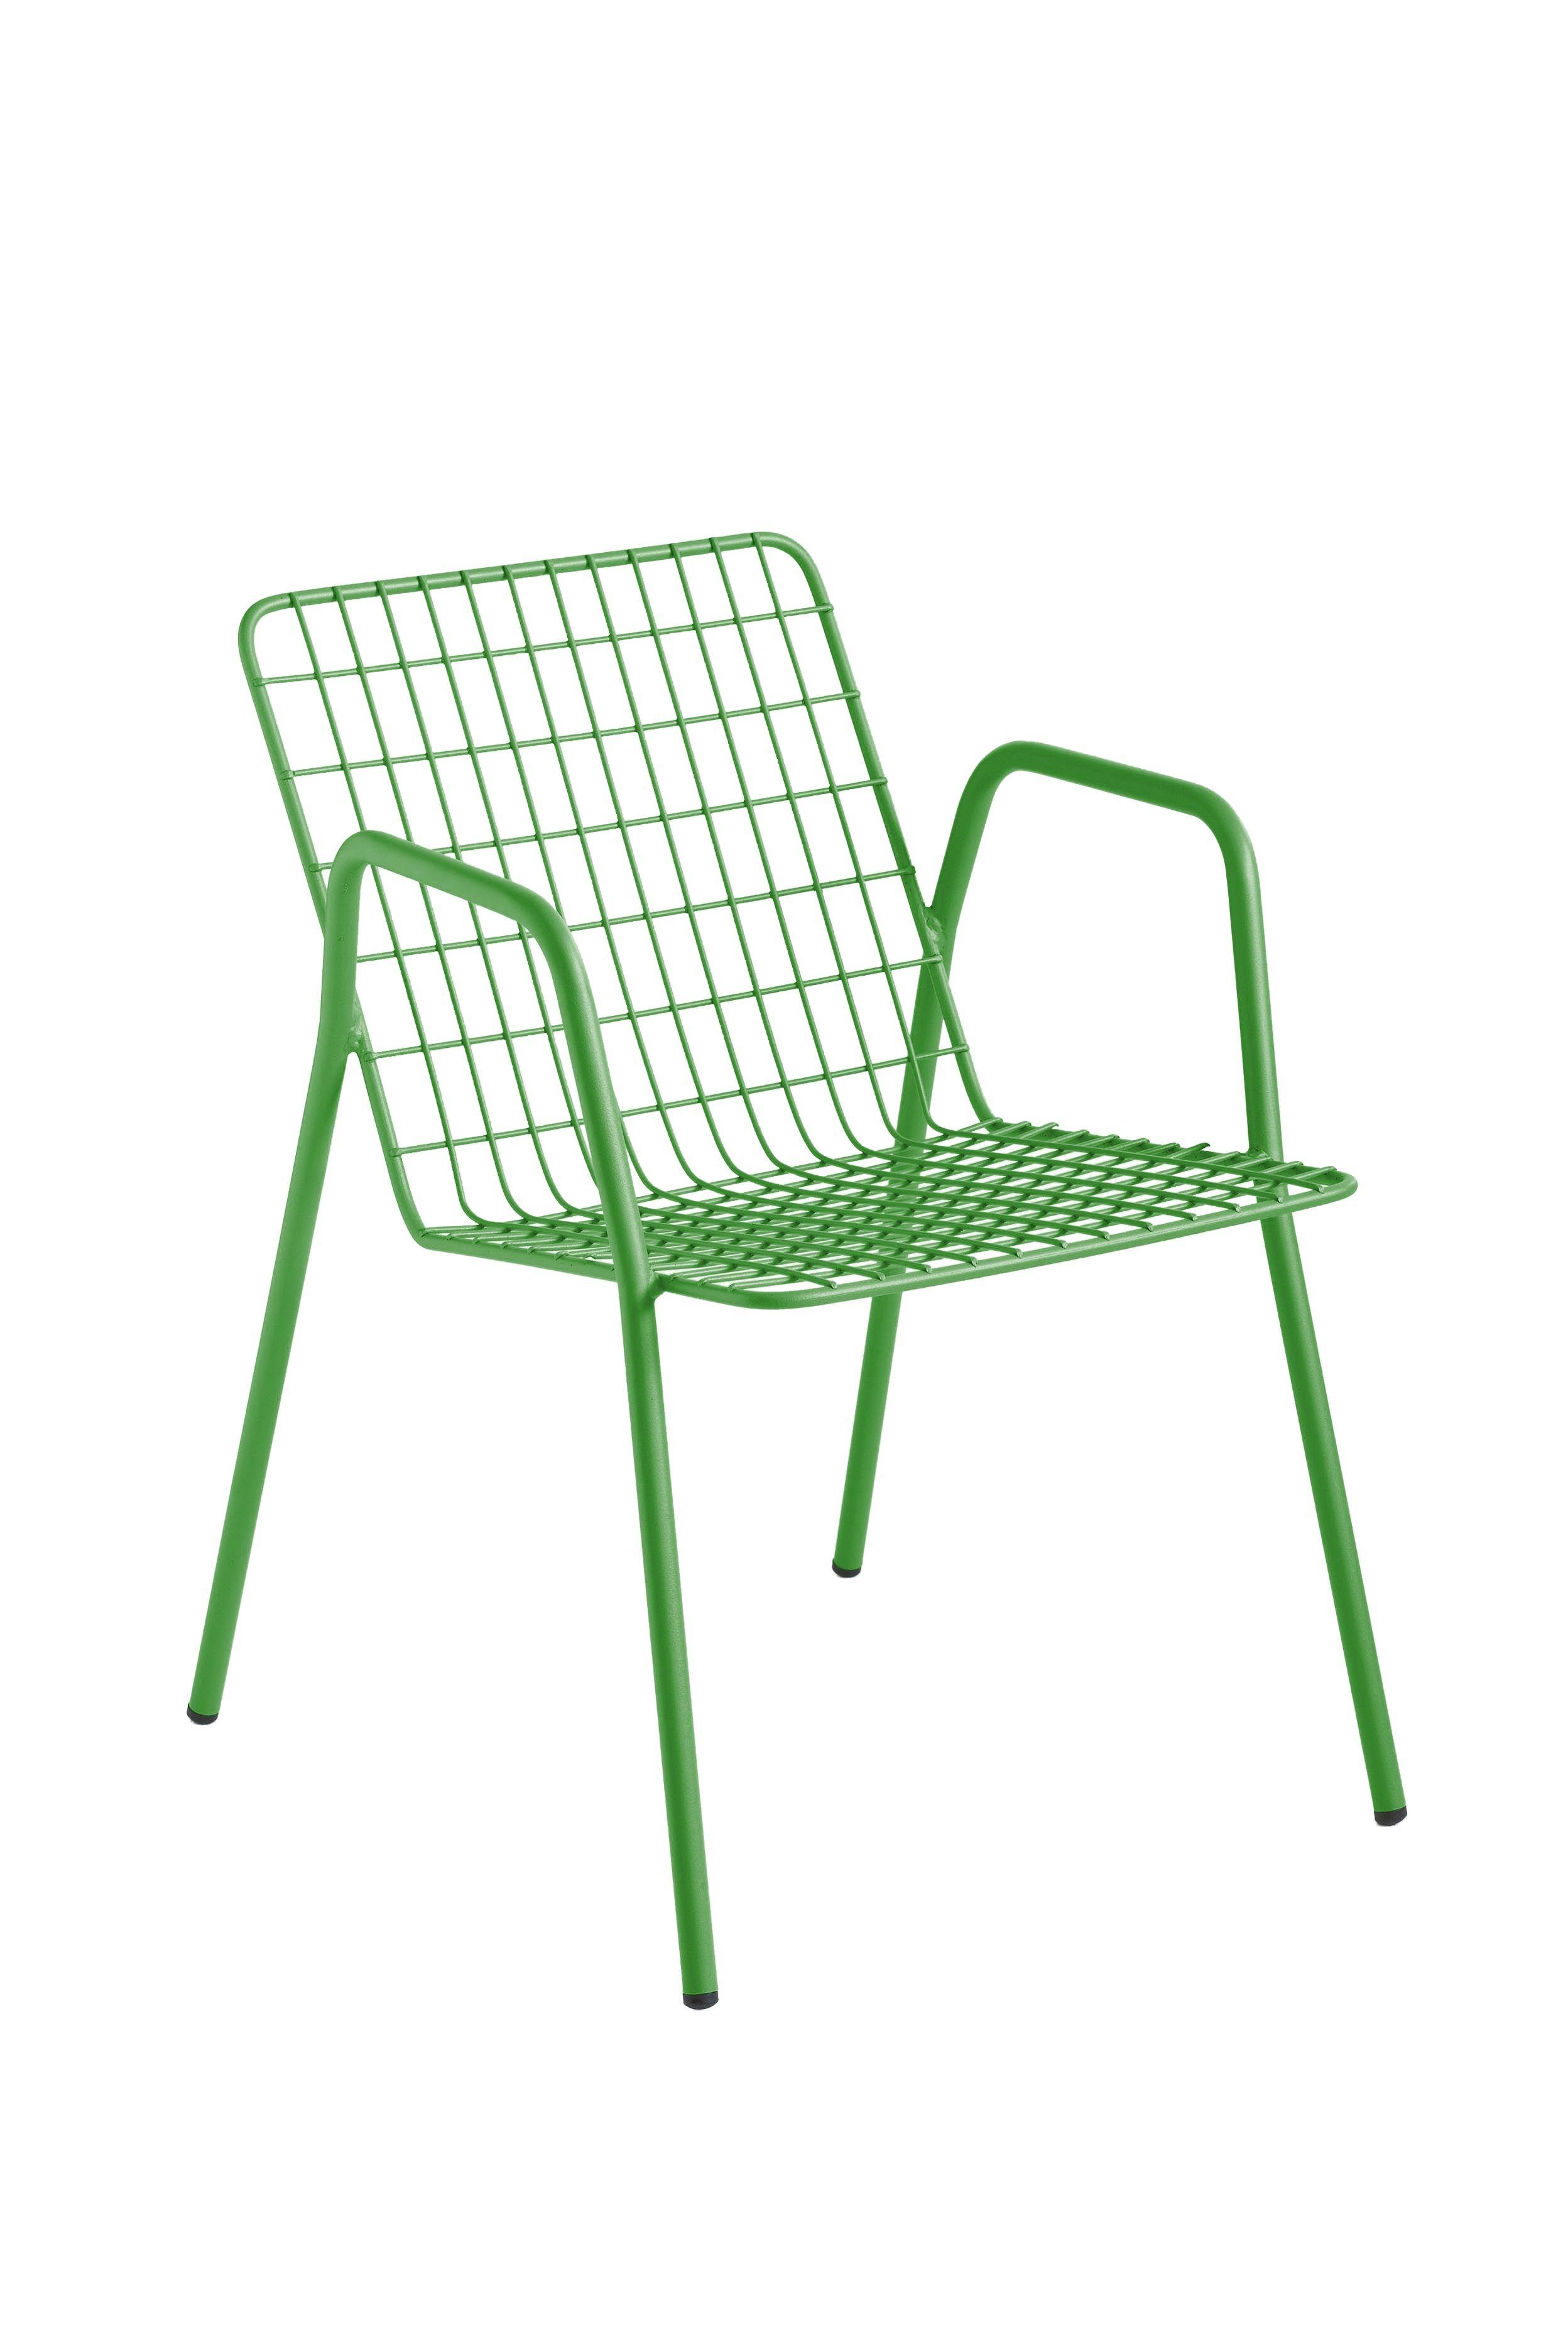 sillón RIVIERA | Novedades iSi mar 2015 | Outdoor chairs